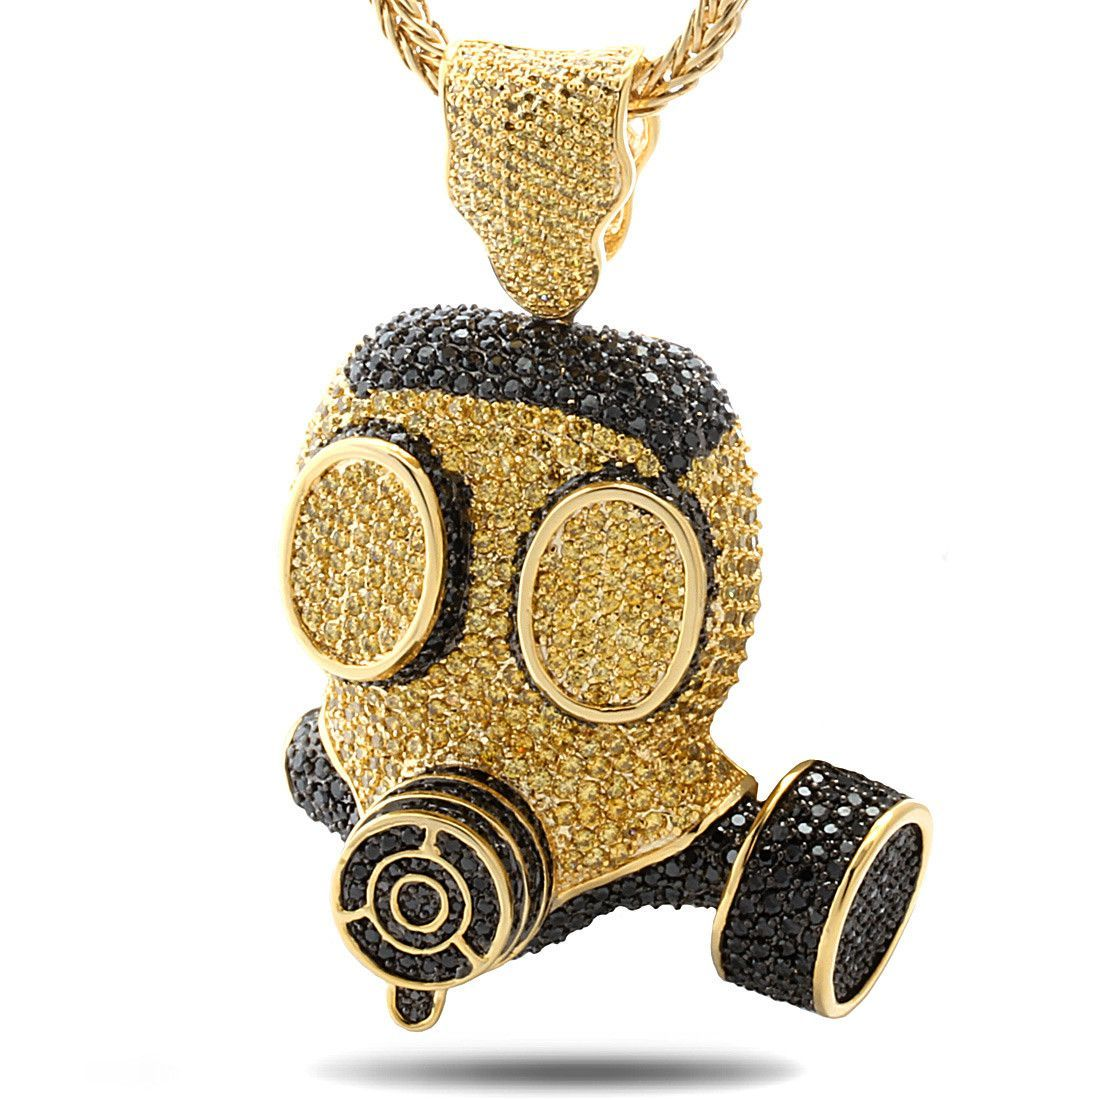 The 14k gold gas mask necklace aloadofball Images